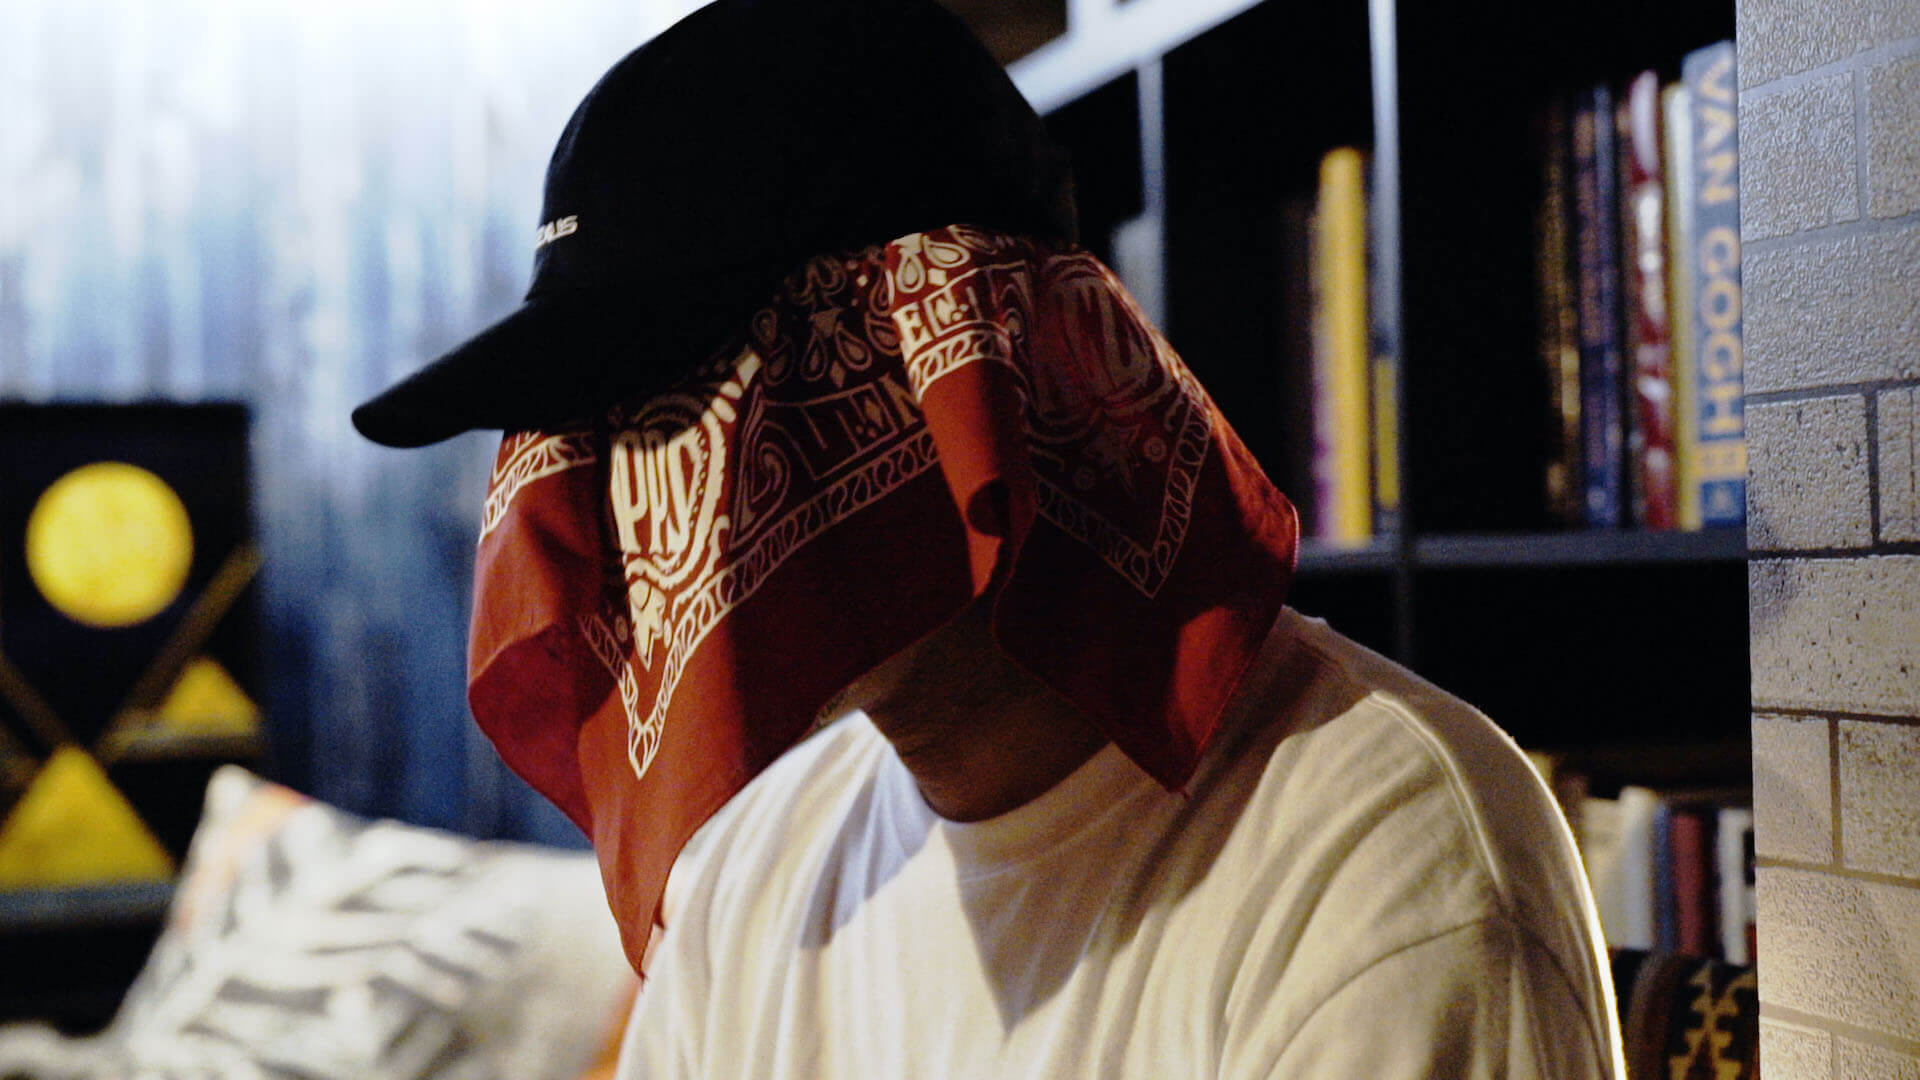 MANTLE as MANDRILLの最新作『SEXORCIST OF THE LIVING SAGA』から「KUROSAWA」のMVが公開 music201120-mantle-as-mandrill-1